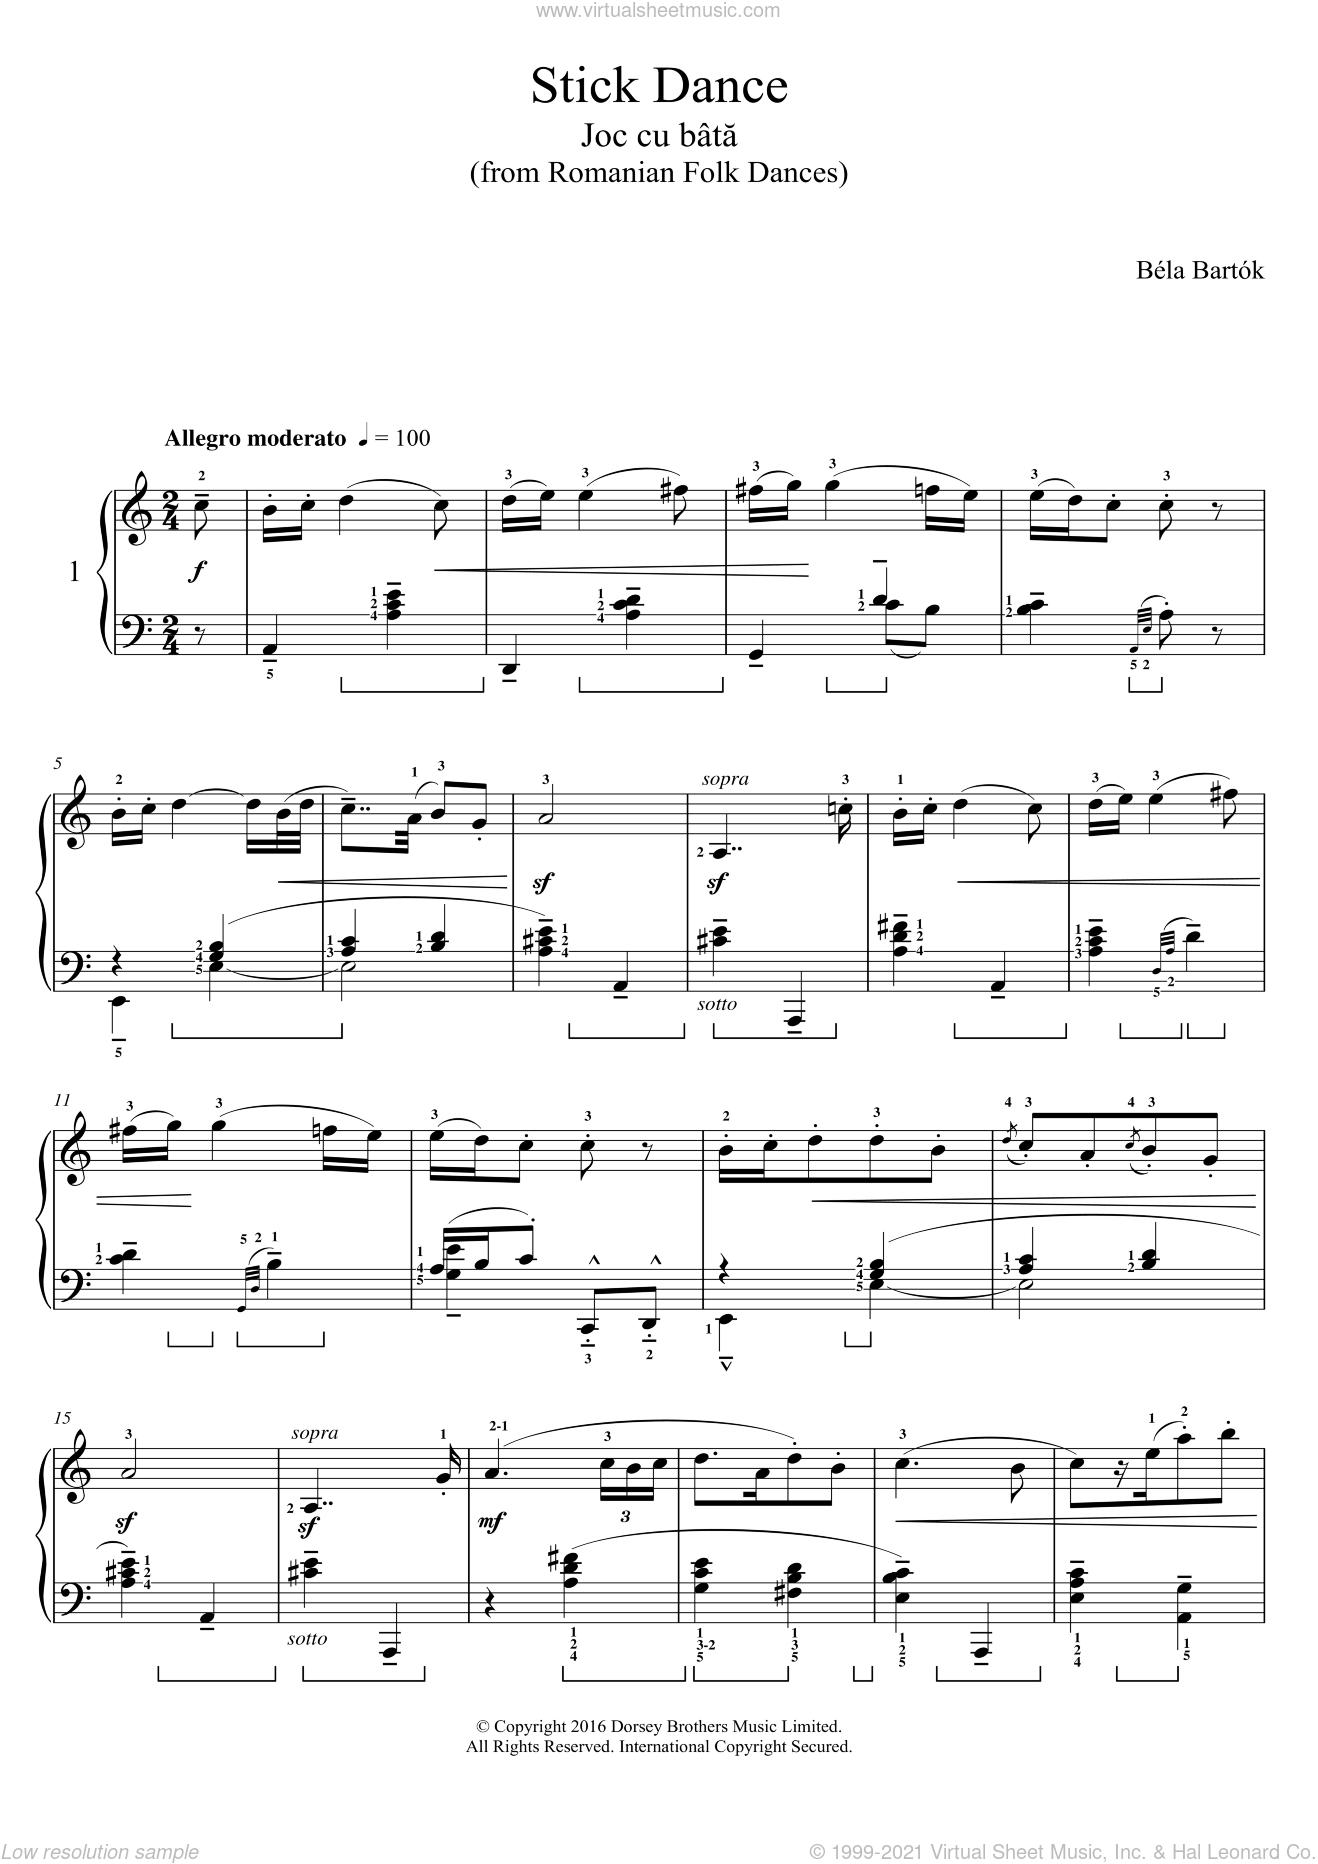 Stick Dance (from Romanian Folk Dances) sheet music for piano solo by Bela Bartok and Bela Bartok, classical score, intermediate skill level